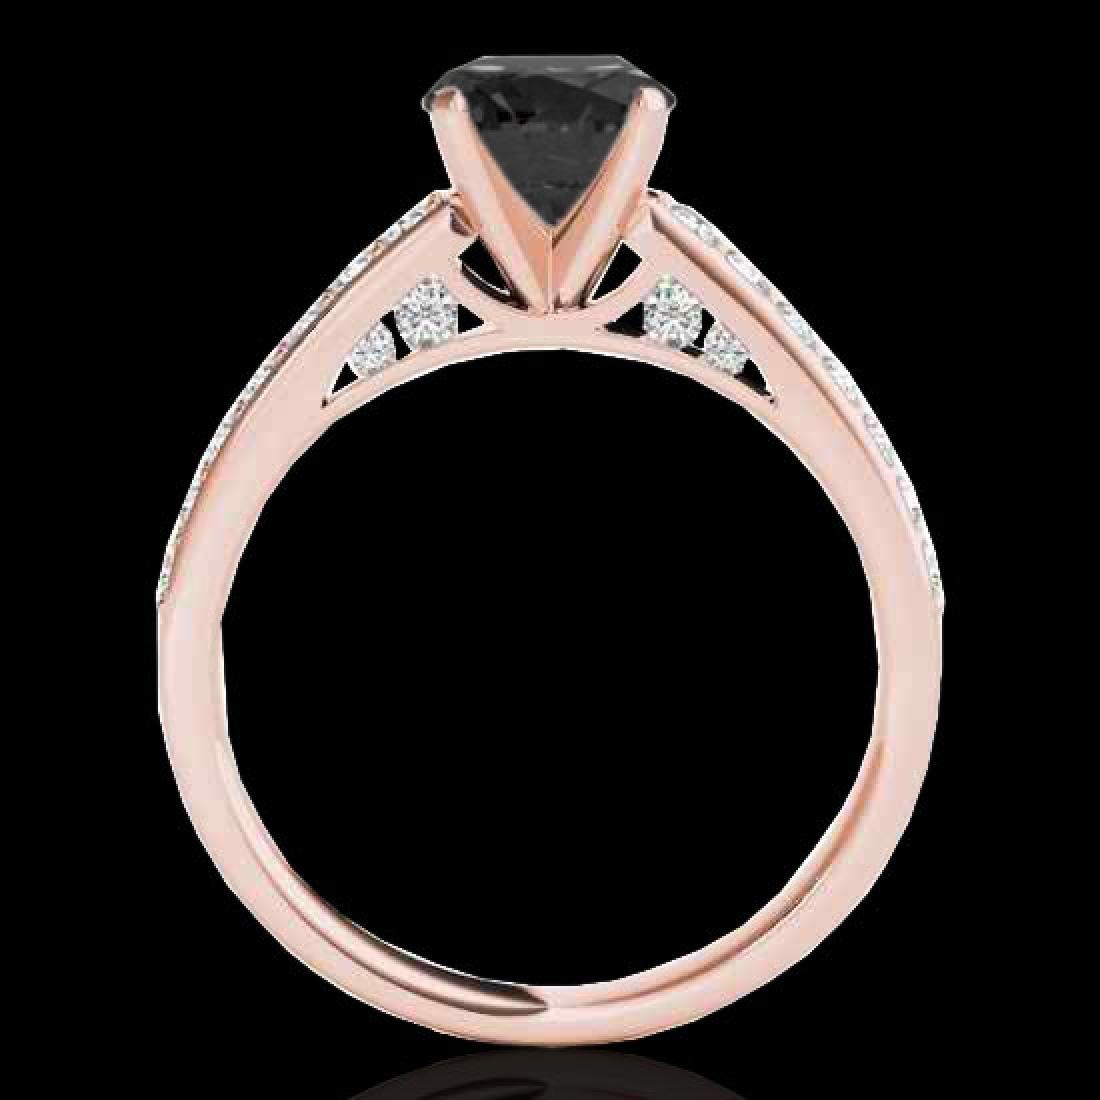 1.5 CTW Certified VS Black Diamond Solitaire Ring 10K - 2